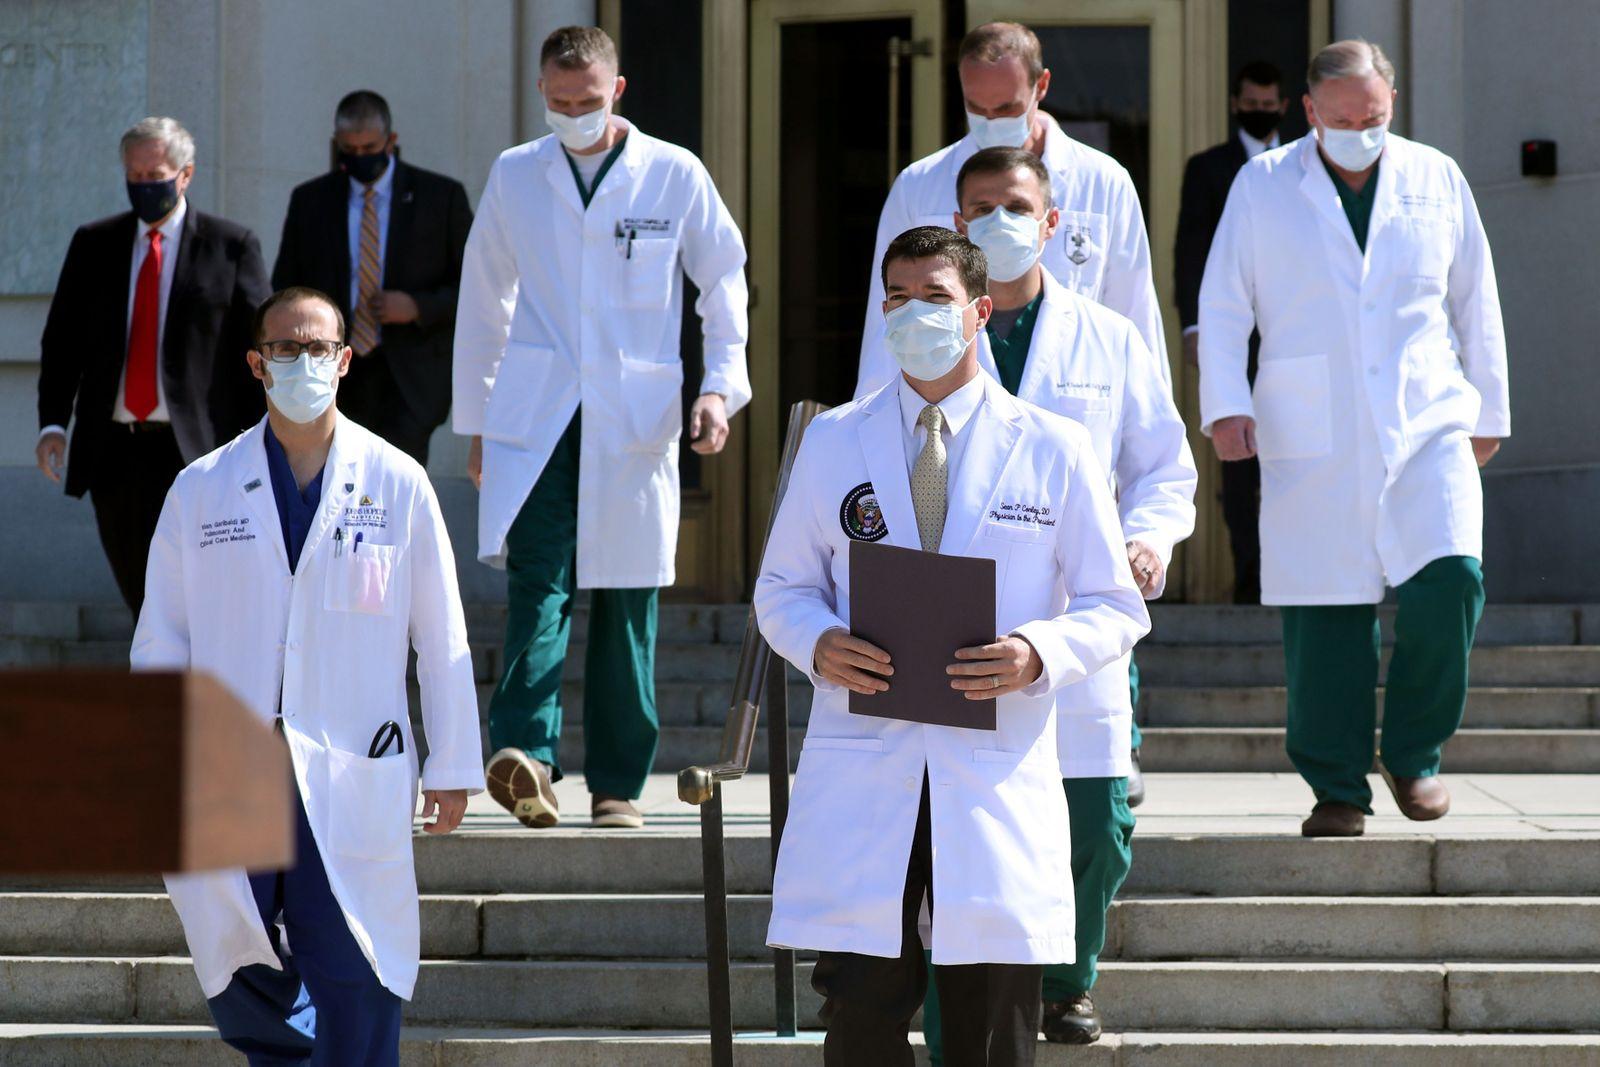 US President Donald J. Trump treated at Walter Reed Hospital after testing positive for coronavirus COVID-19, Bethesda, USA - 04 Oct 2020